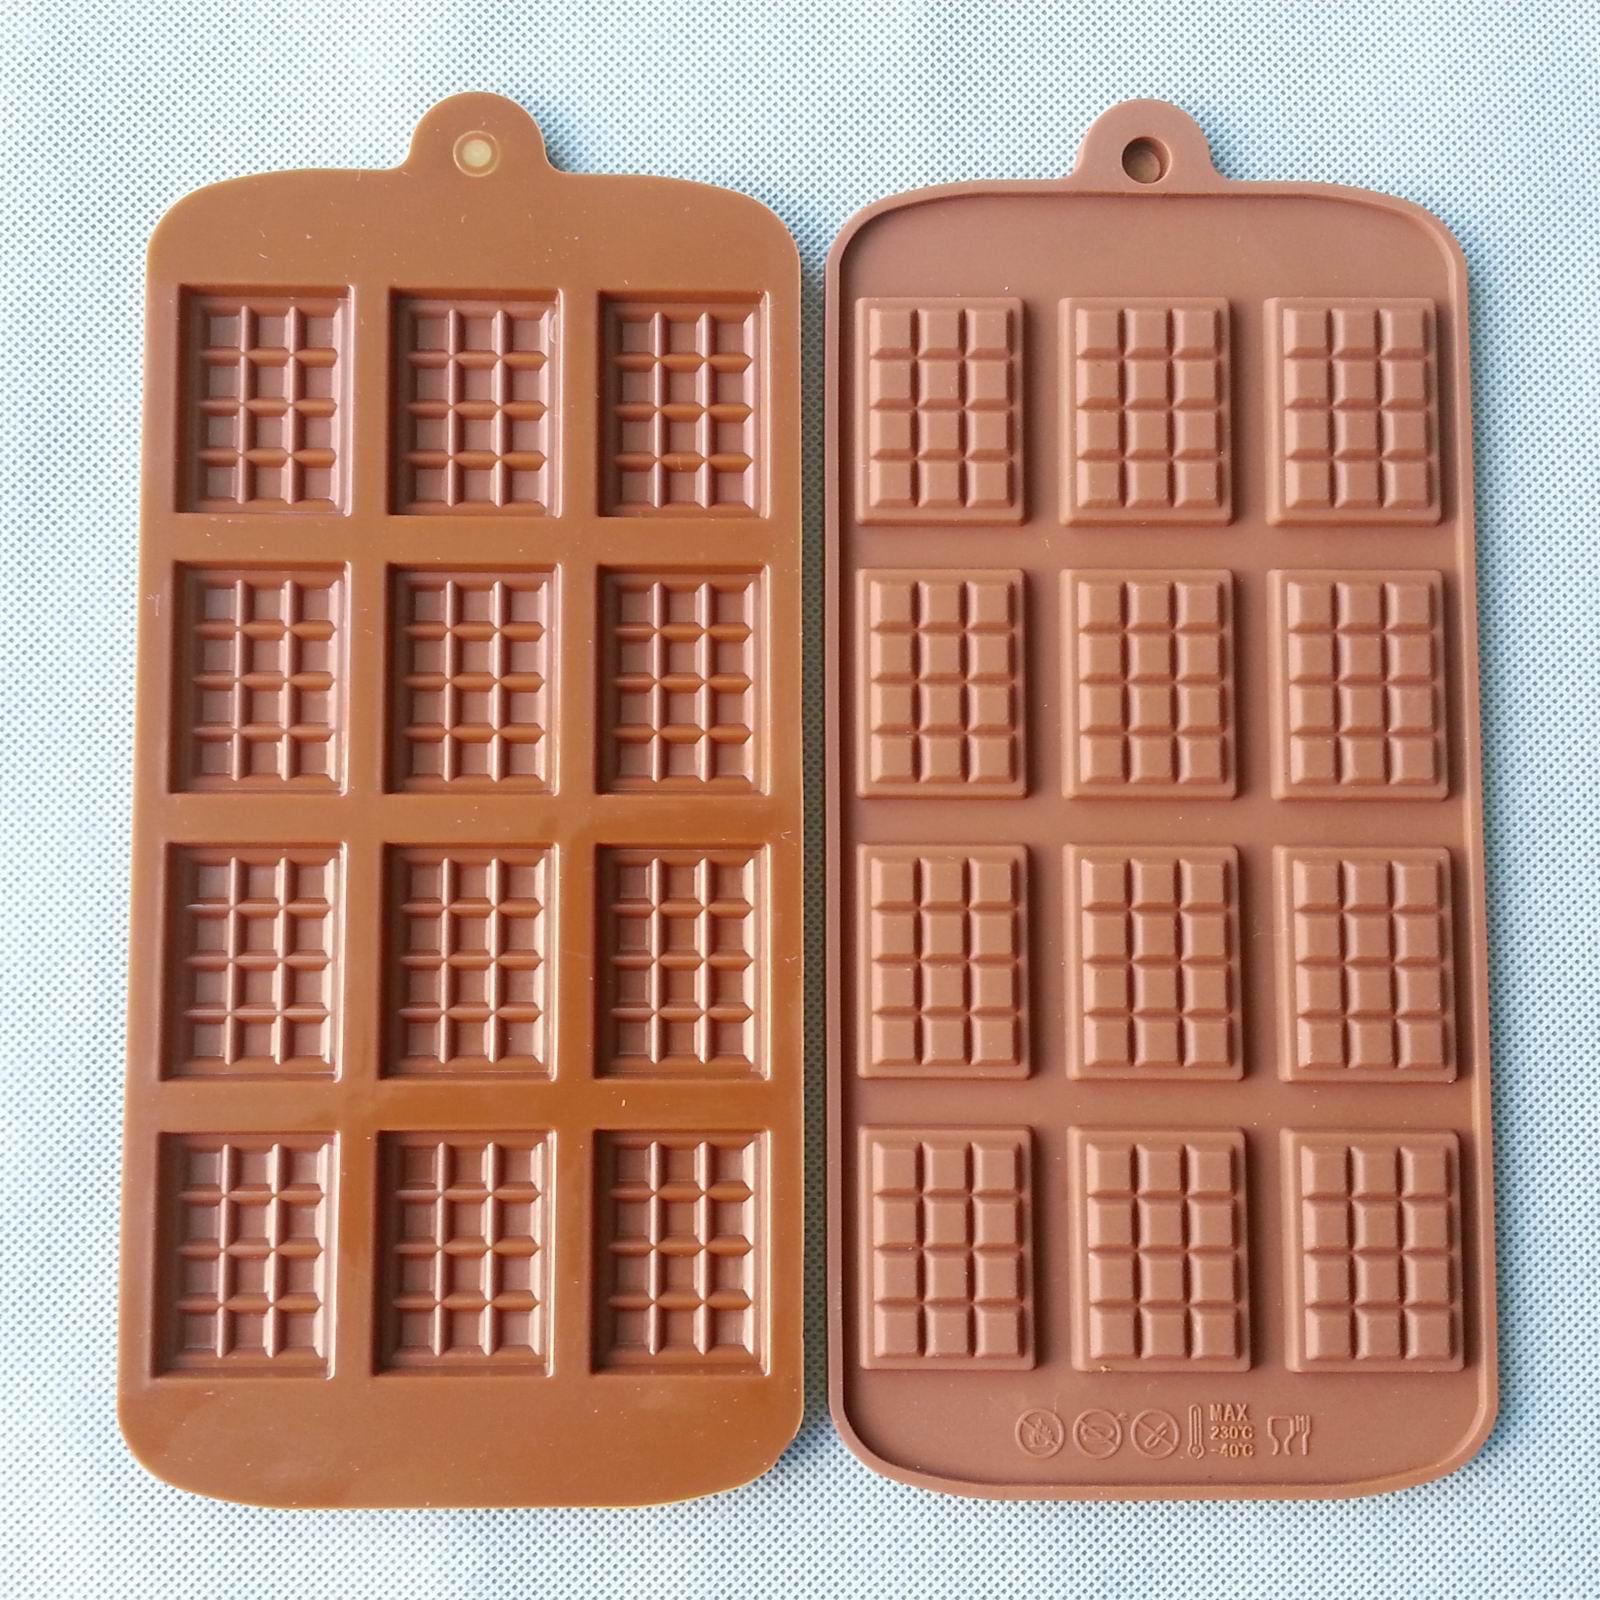 silikonformar till choklad